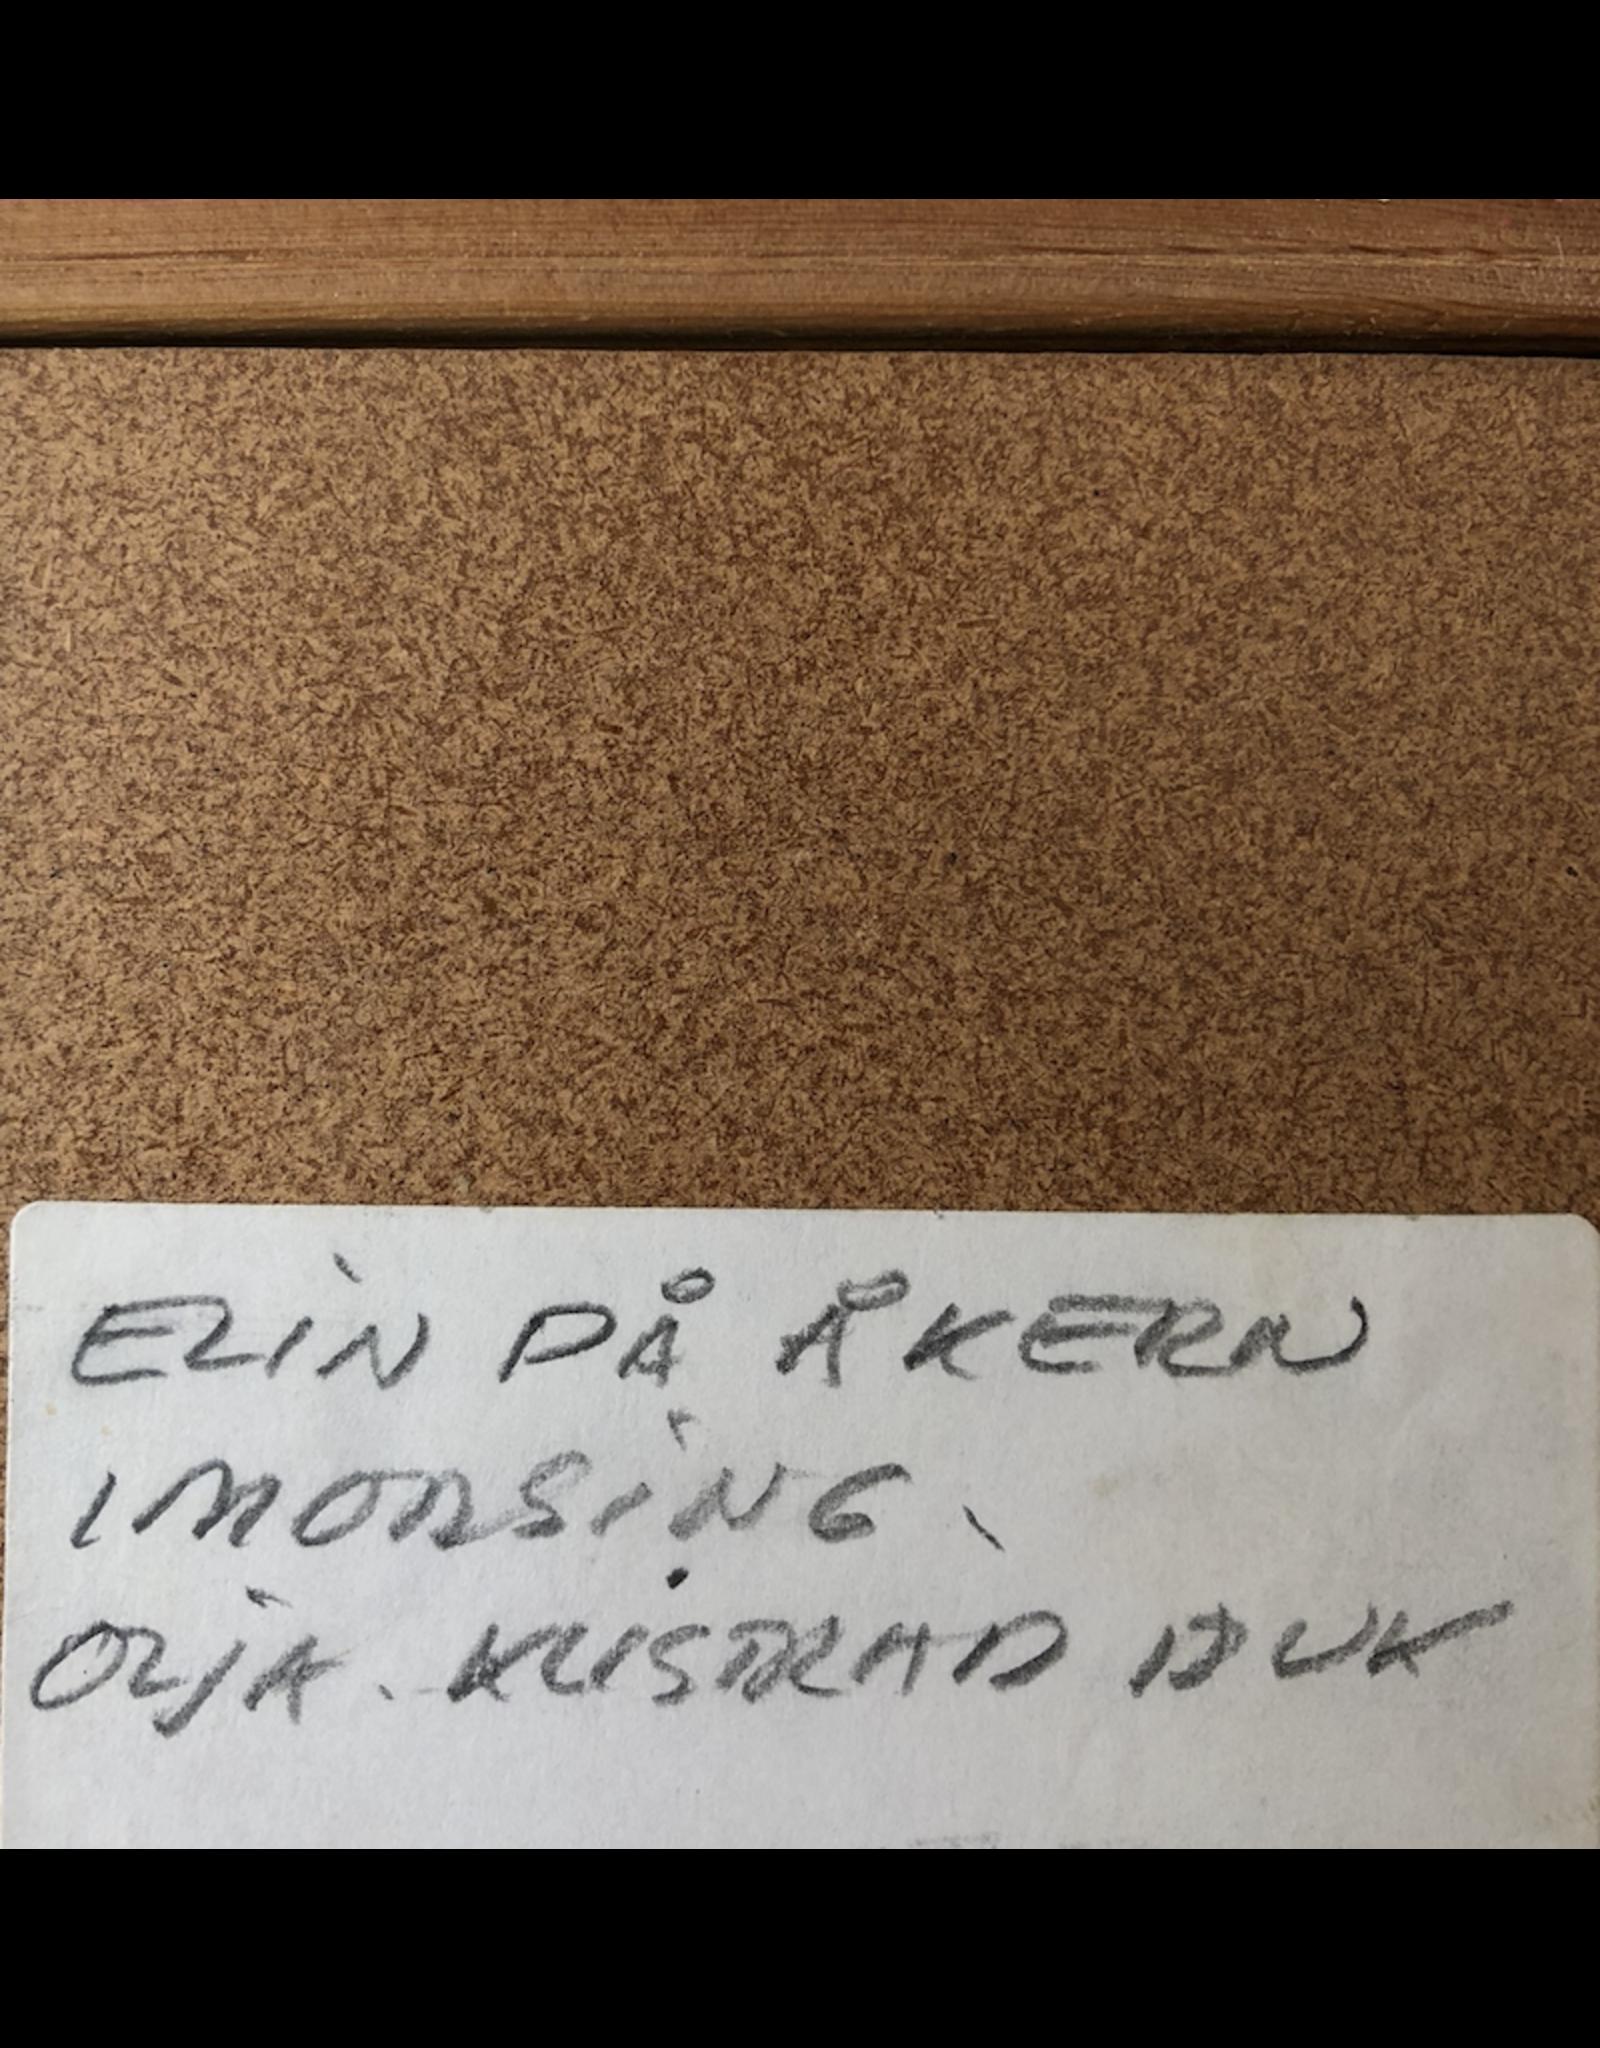 "MANKS ANTIQUES ""ELIN在田间"" 稀有油畫連框"